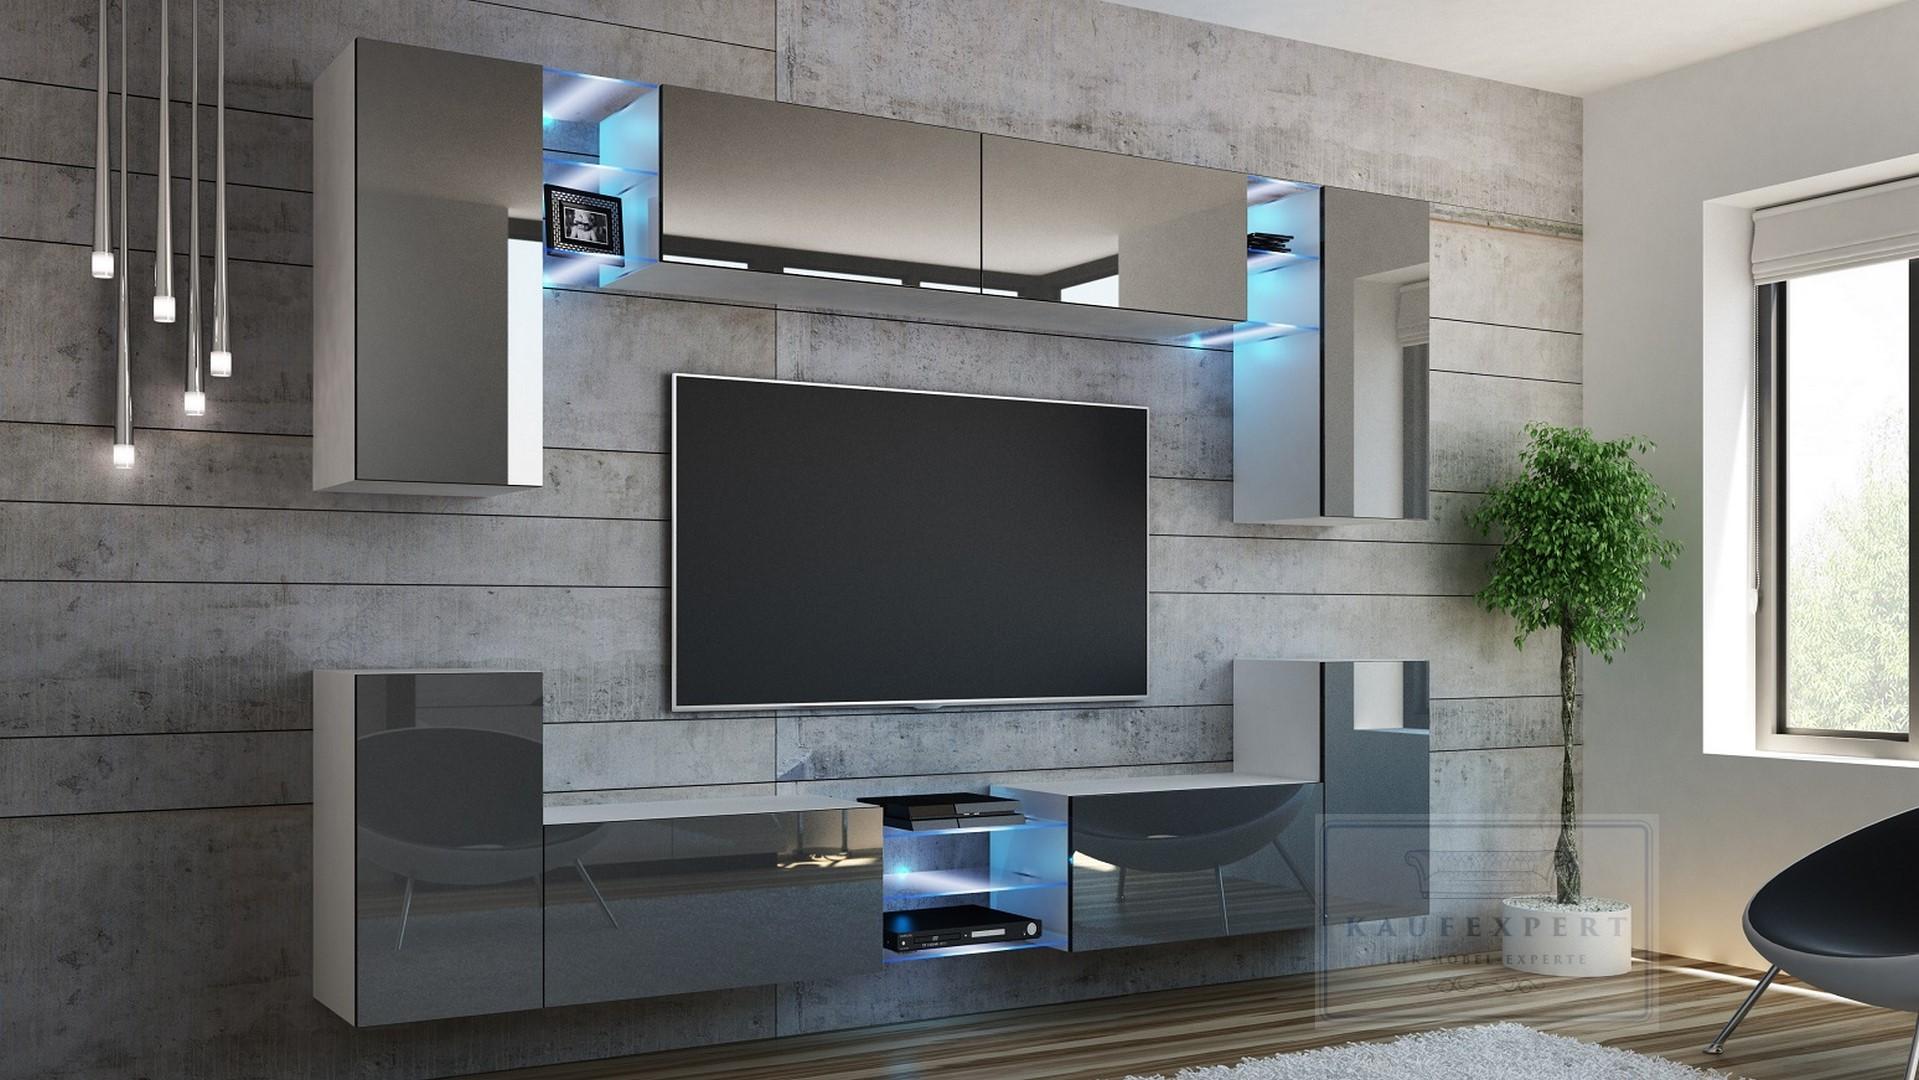 wohnwand galaxy 270 neue bessere version mdf hochglanz concept mediawand led ebay. Black Bedroom Furniture Sets. Home Design Ideas